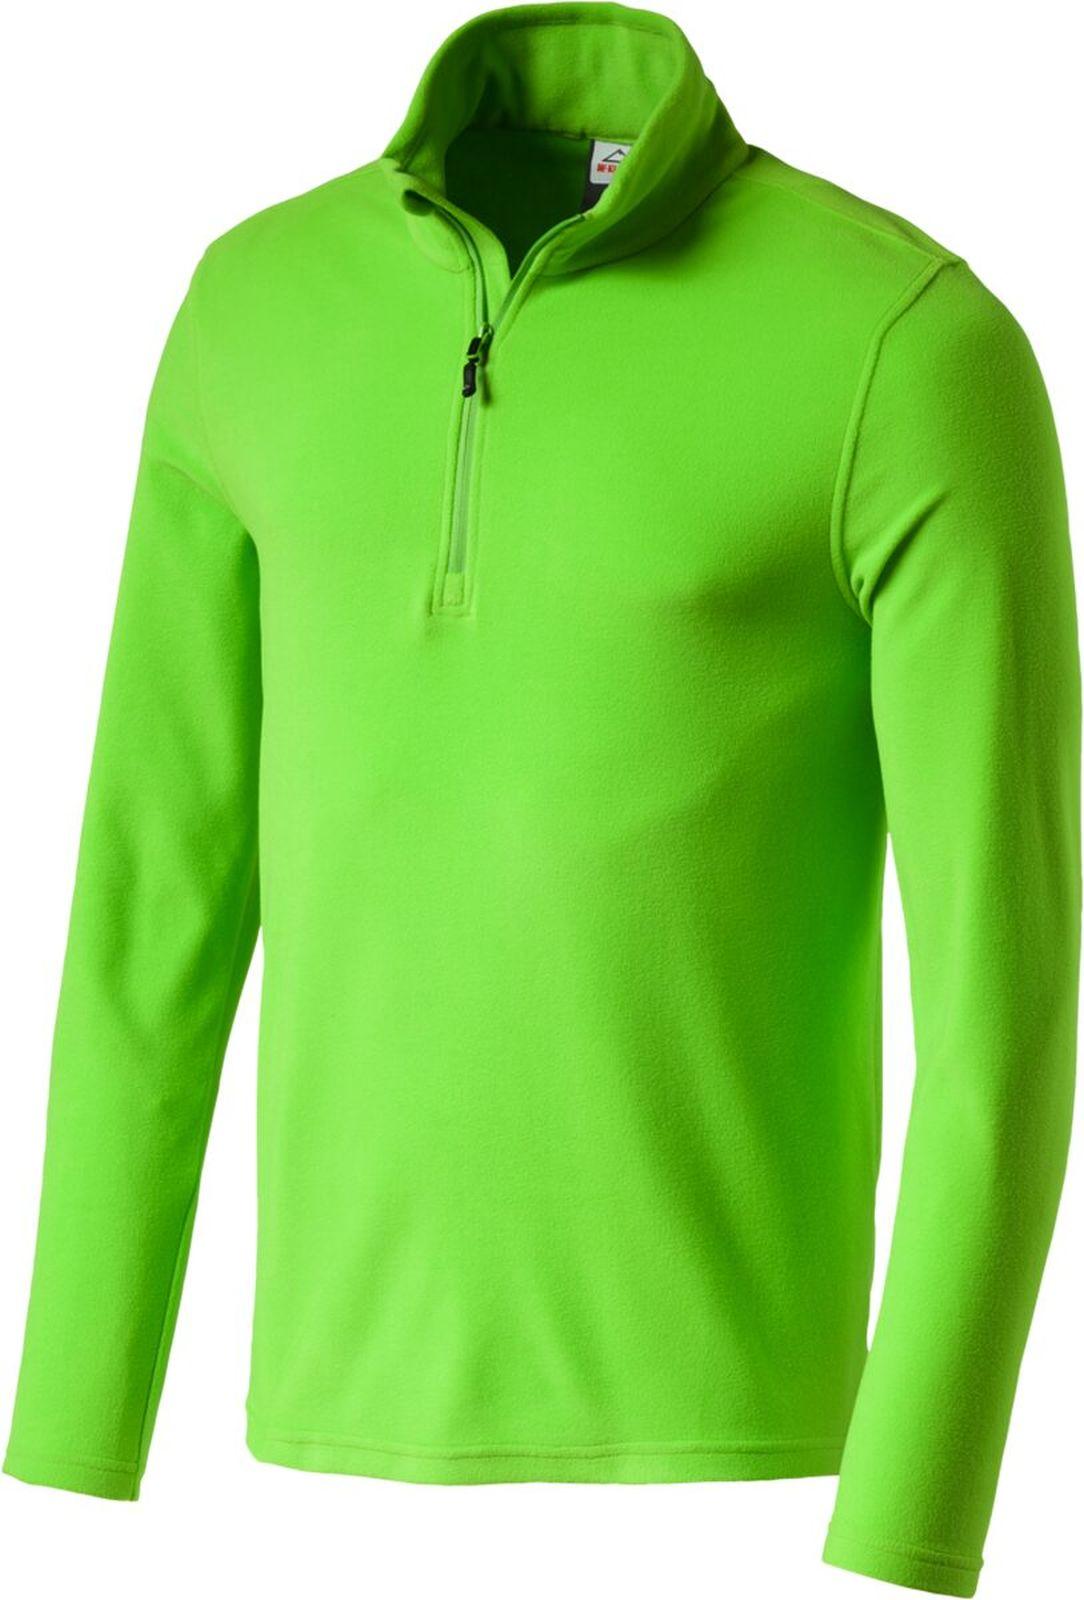 McKinley Herren Ski-Fleece Rolli Sweatshirt CORTINA II schwarz